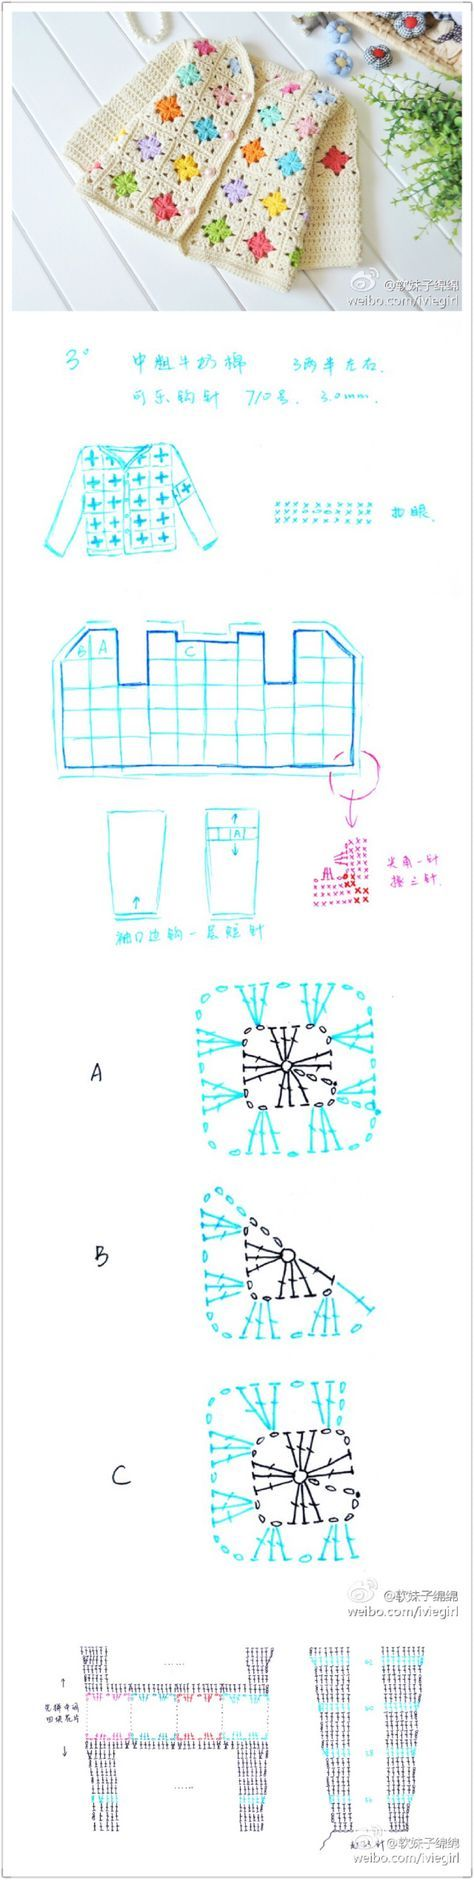 i.pinimg.com 736x 8a 2e 00 8a2e00934faabb5f471da2b14df48c8a.jpg